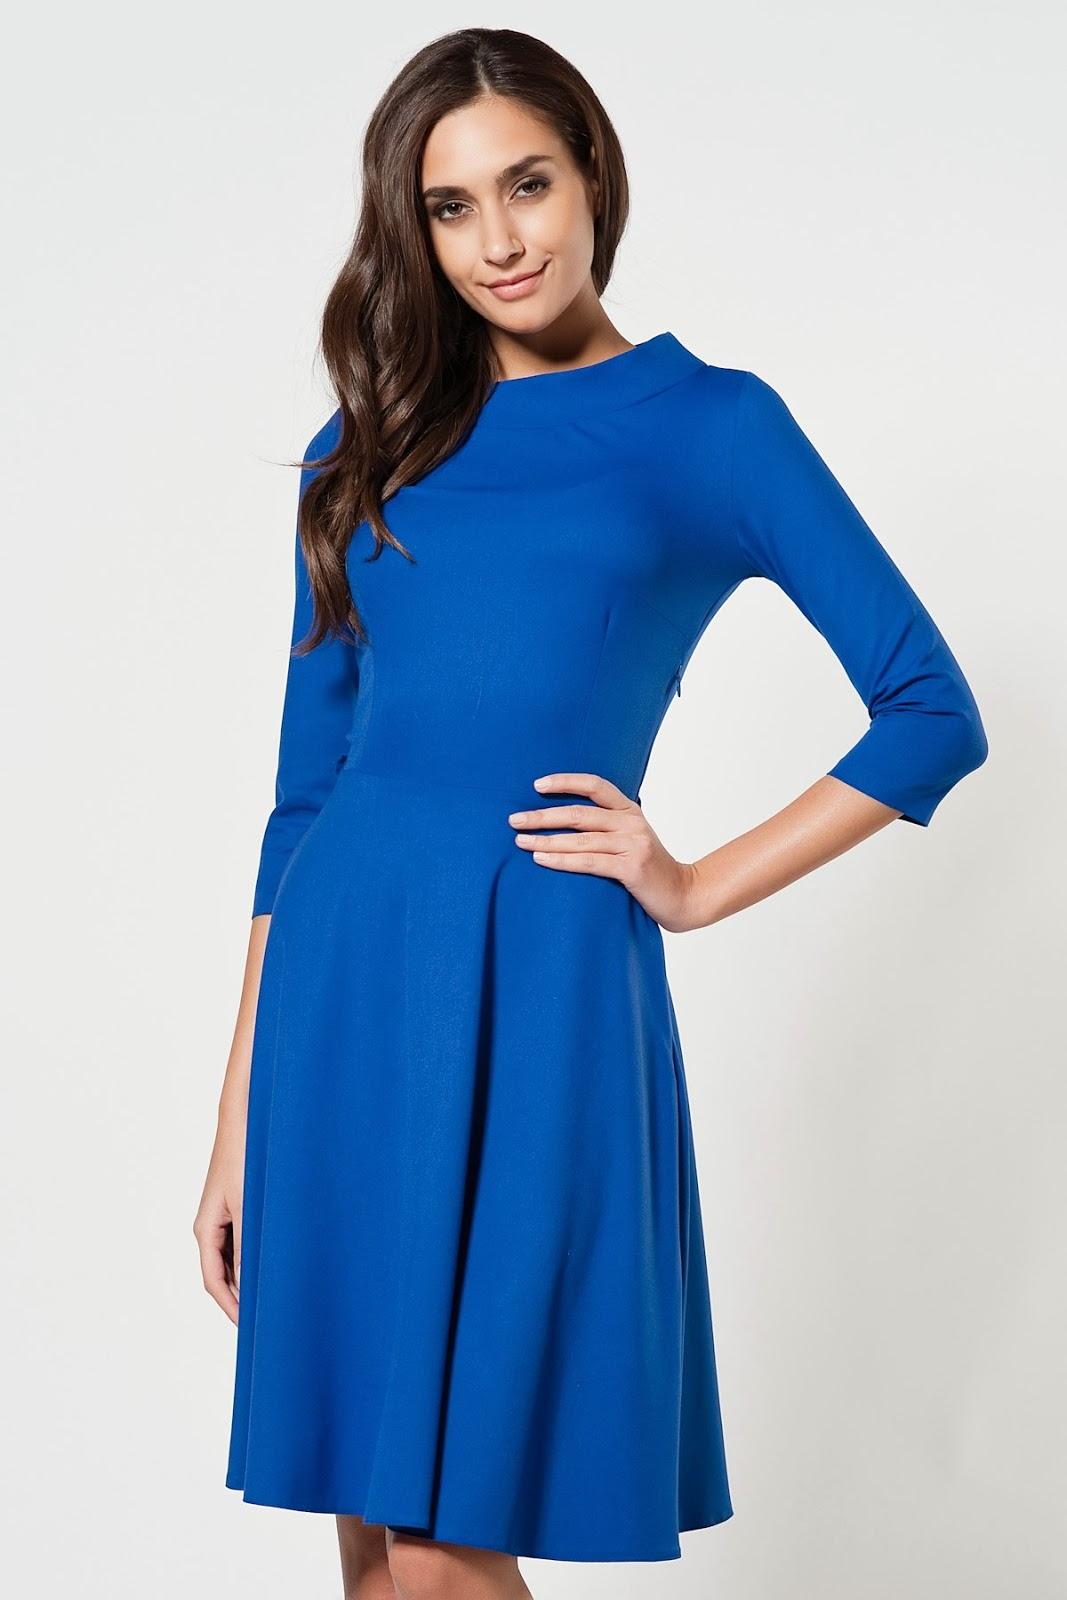 fashionstrendswomen 2015 ladies casual dress models